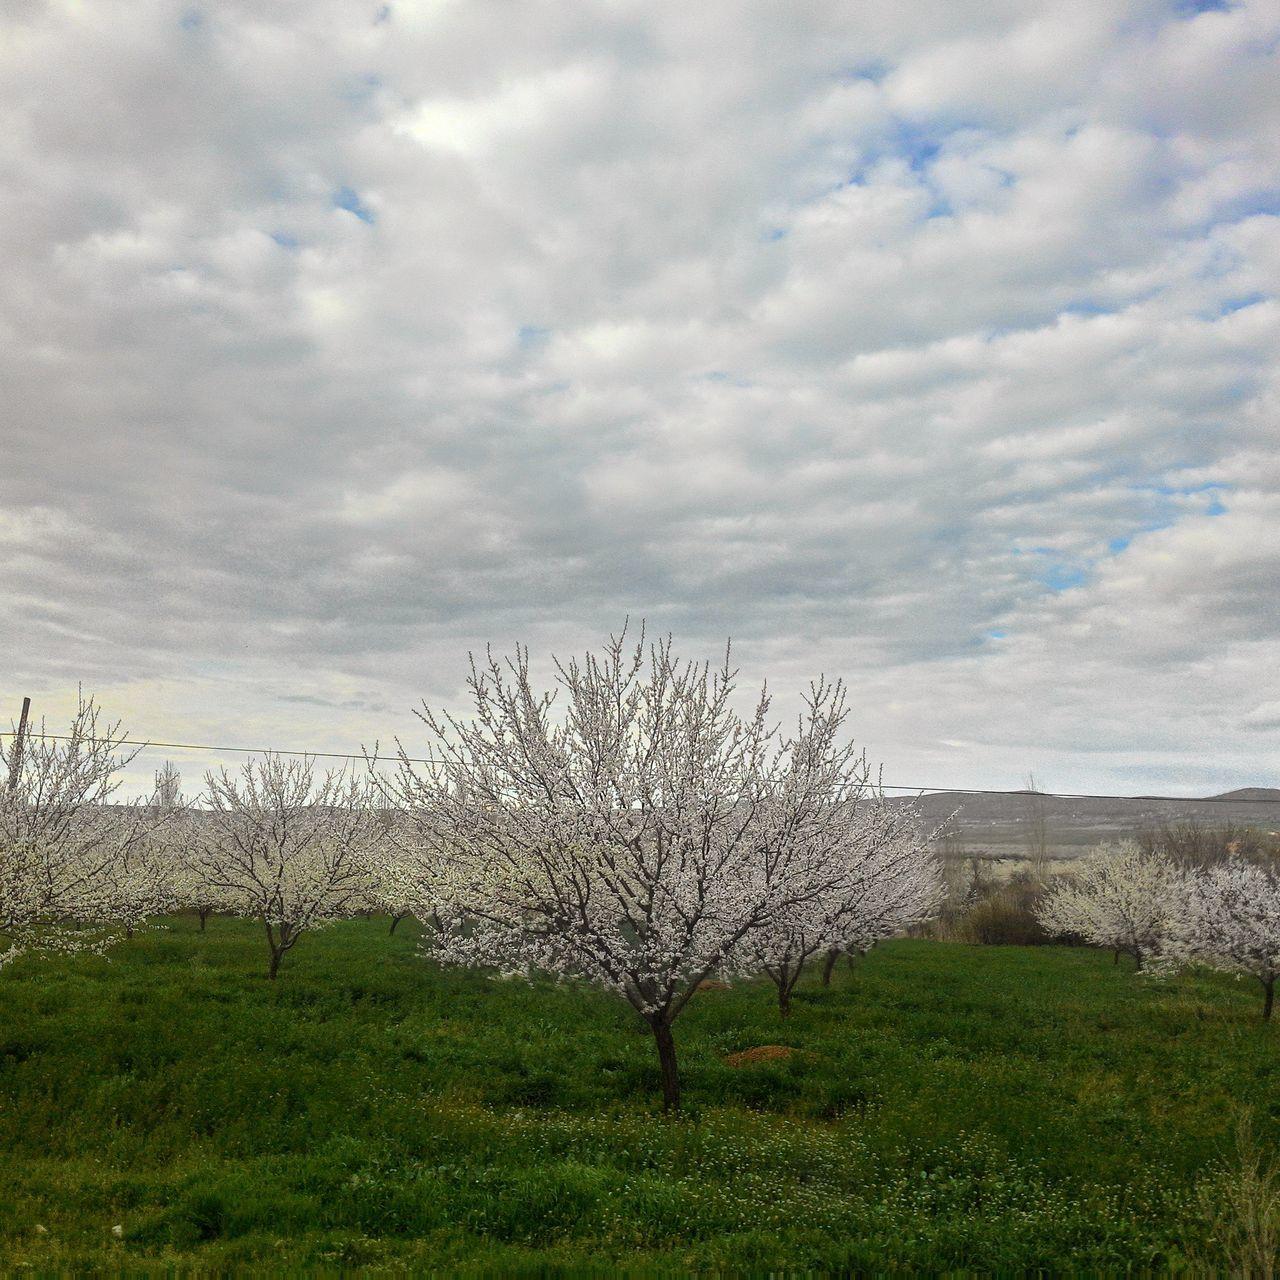 The Great Outdoors With Adobe Malatya Apricot Tree No Filter Mylife ♡ Amateurphotographer  Outdoors Turkey Olcay Özfırat